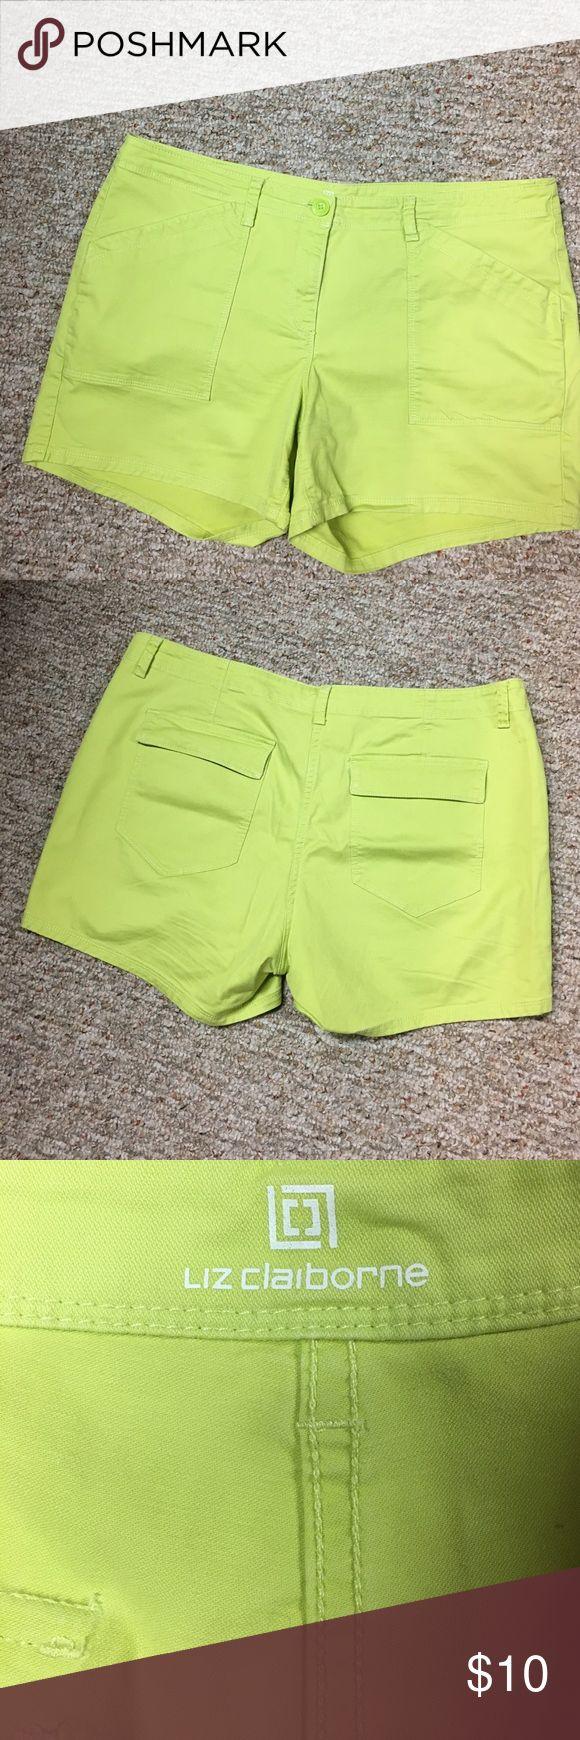 Liz Claiborne shorts Size 16 Liz Claiborne Shorts